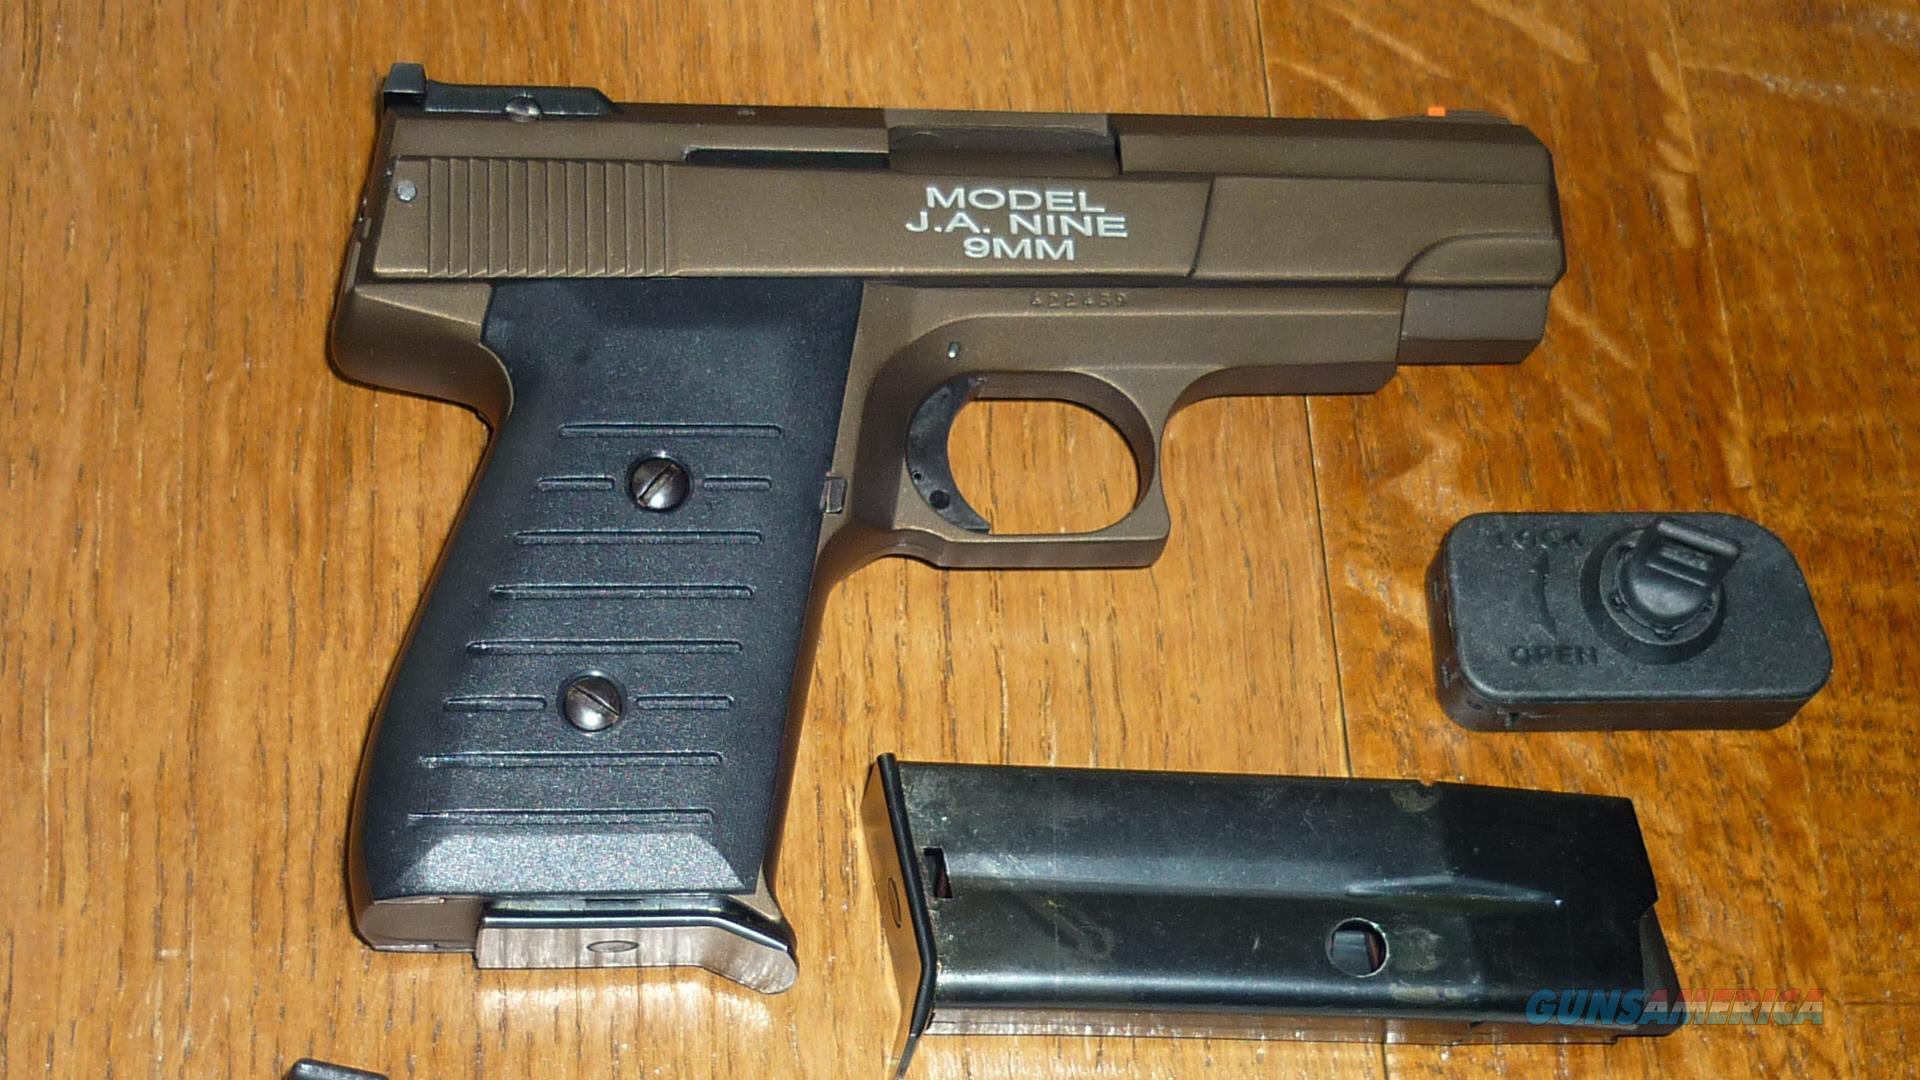 J.A. Nine Pistol in Cerakote Midnight Bronze Color & 2 Magazines  Guns > Pistols > Jimenez Arms- J.A. Pistols